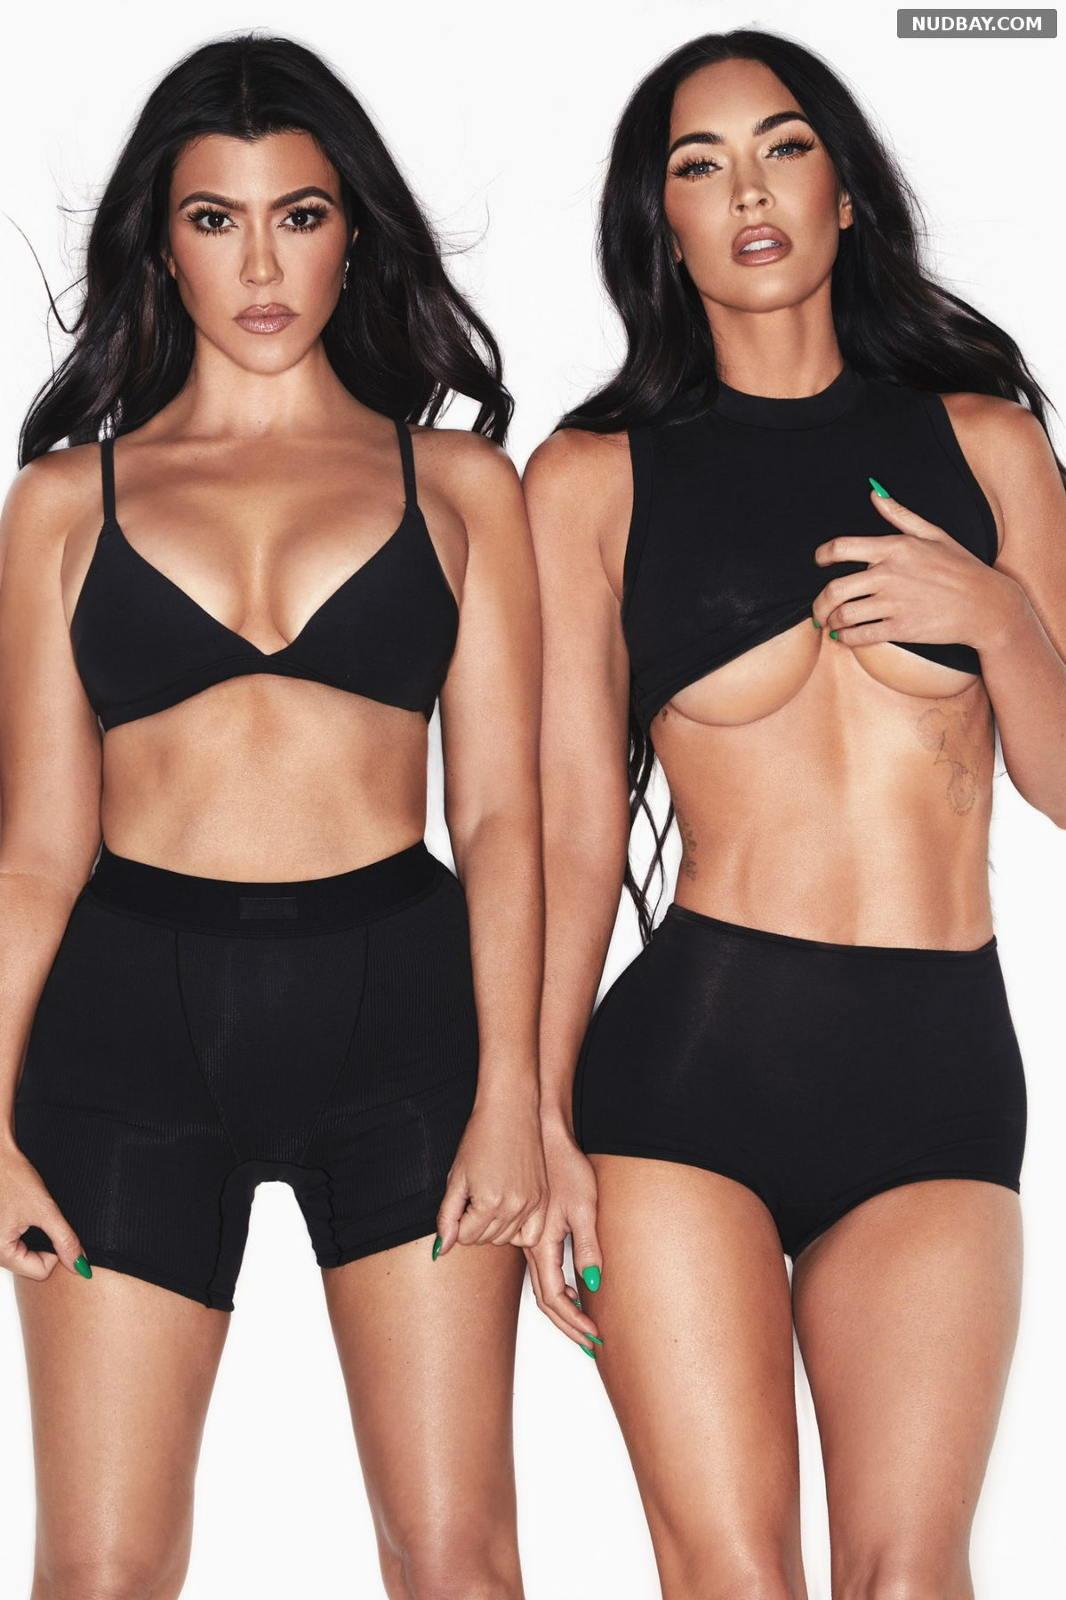 Megan Fox and Kourtney Kardashian Photo shoot September 2021